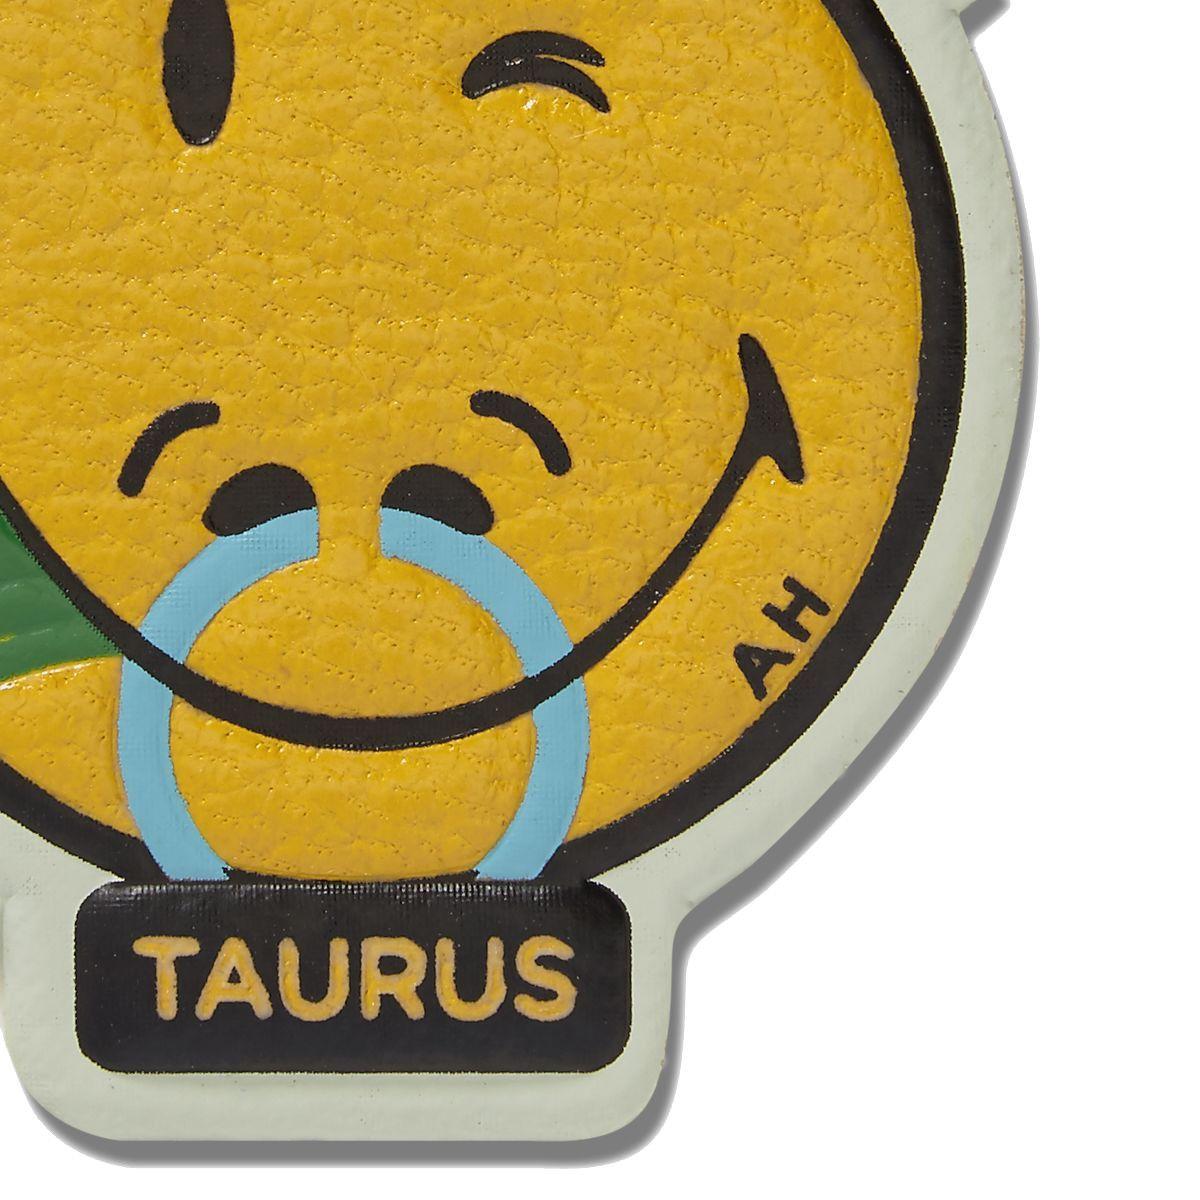 Anya Hindmarch Taurus Sticker